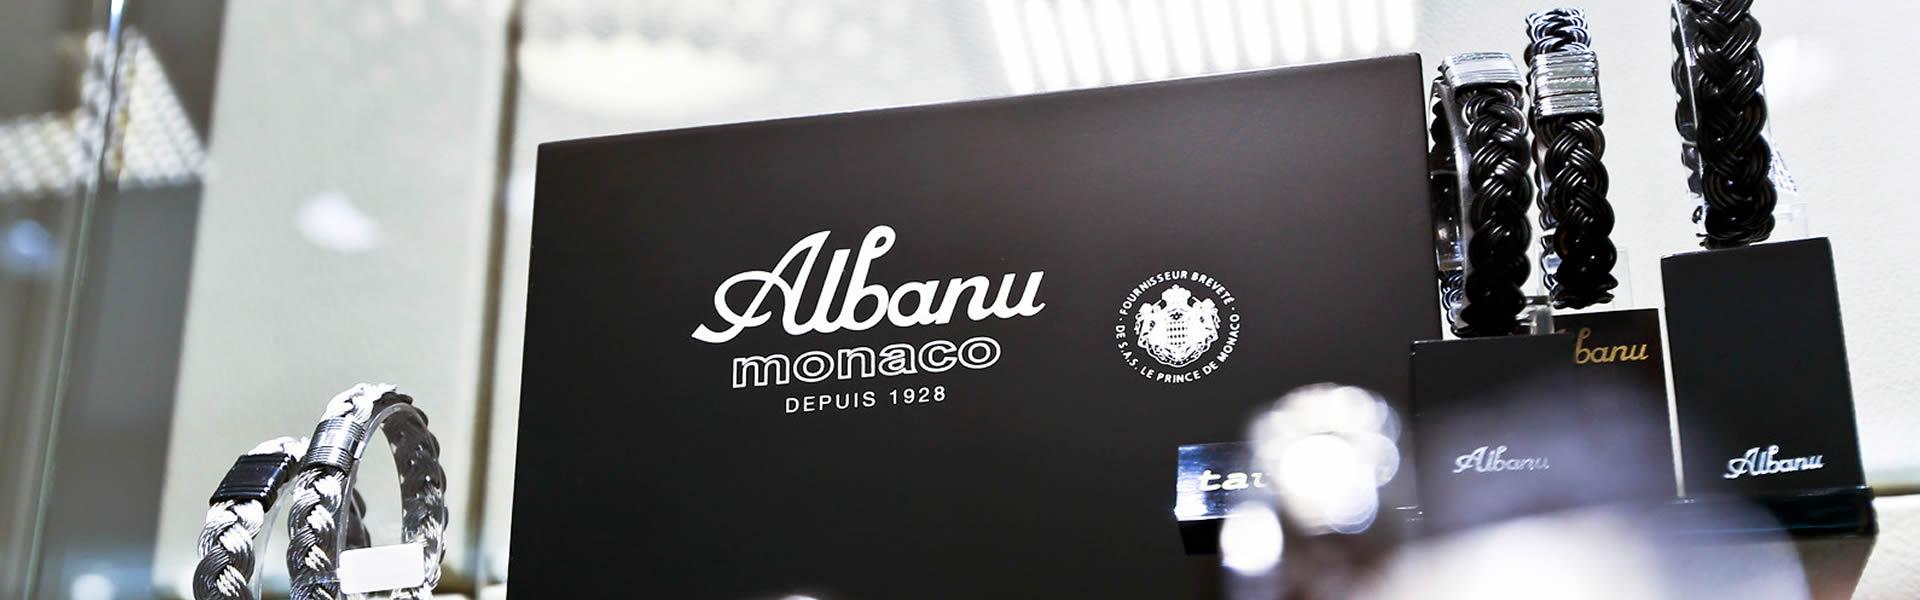 Albanu Monaco 01